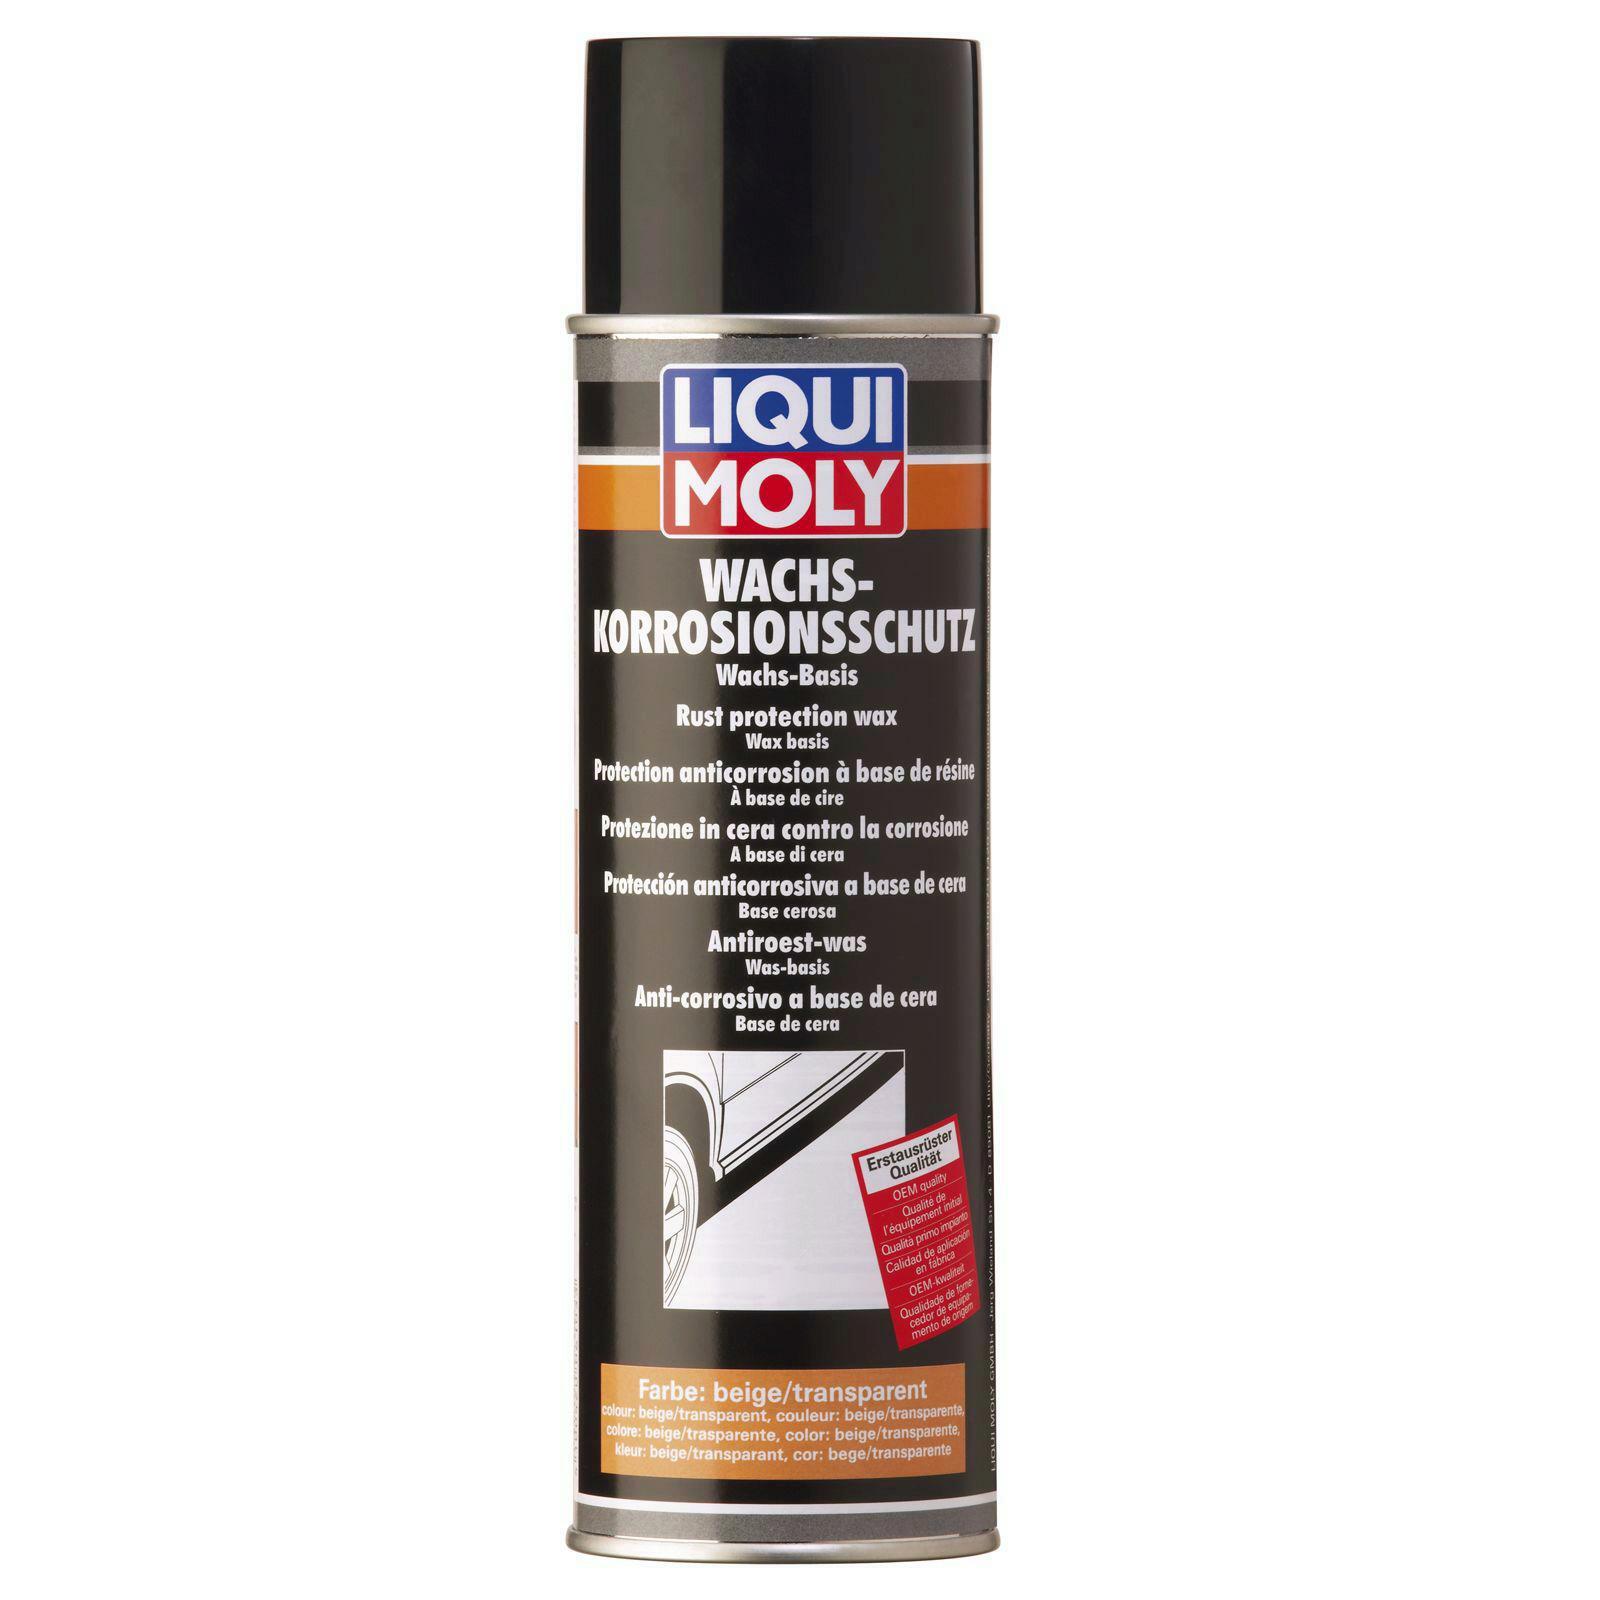 Liqui Moly Wachs-Korrosions-Schutz braun/transparent 500ml